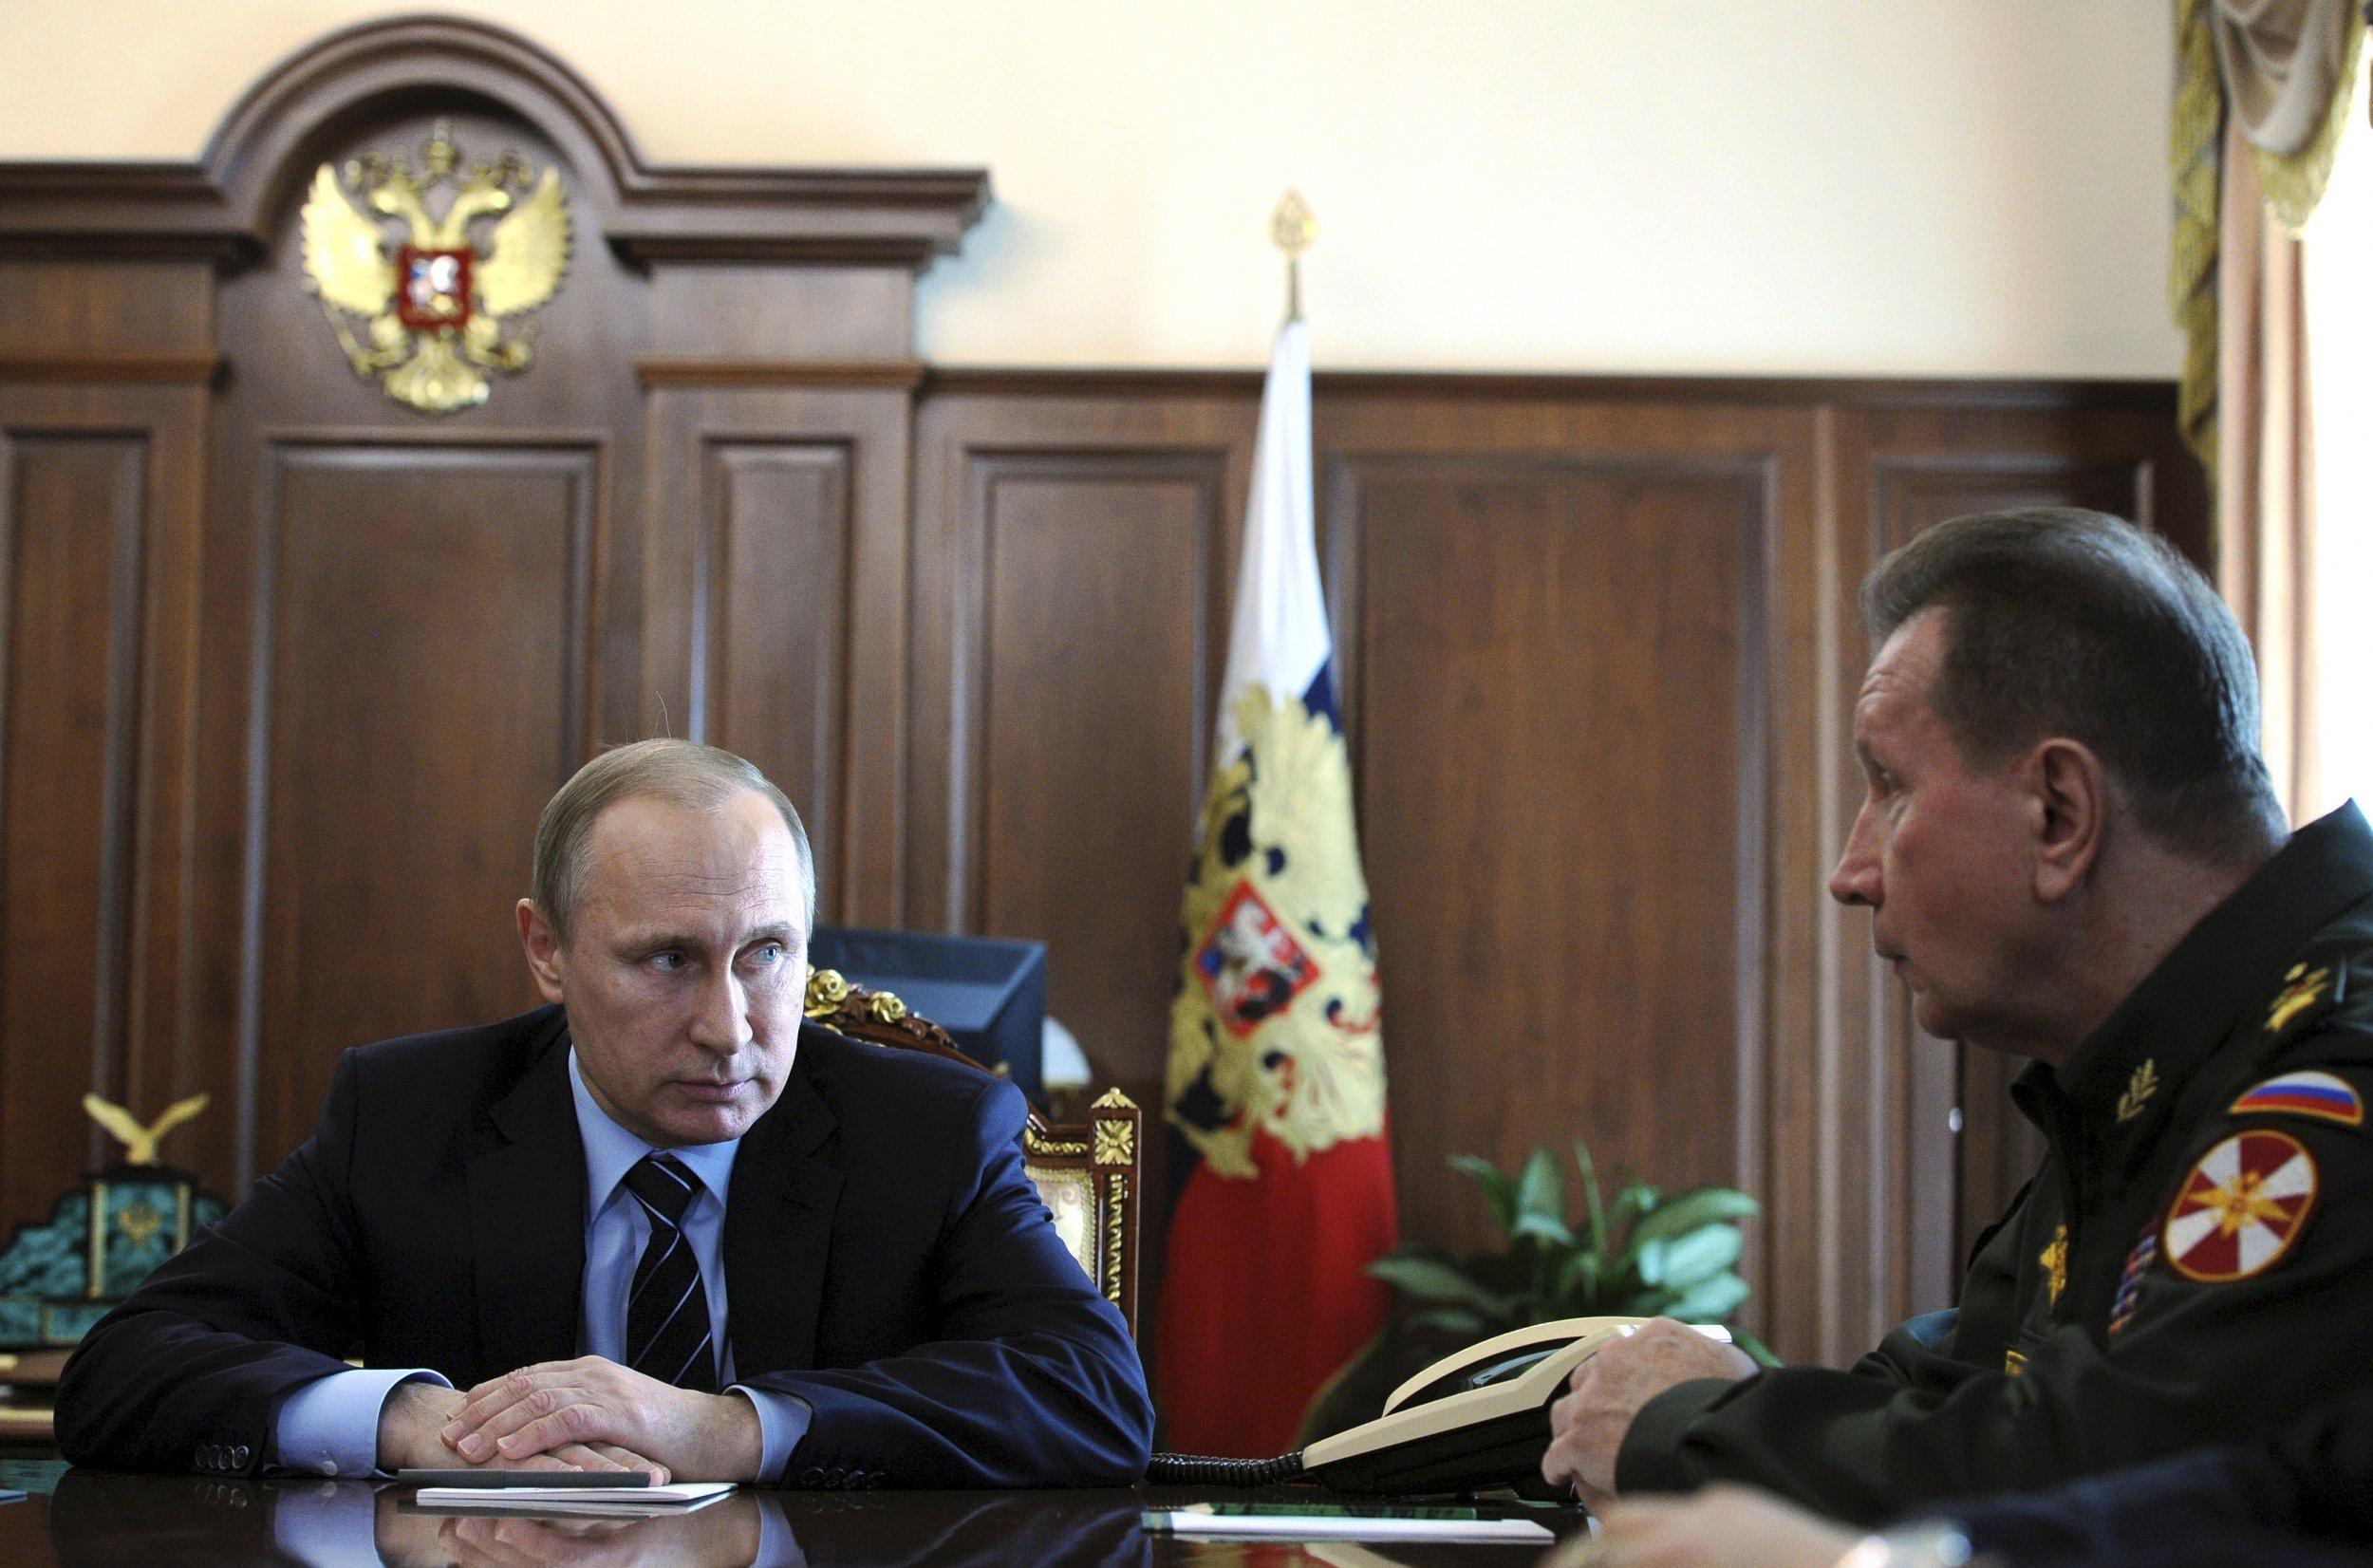 Putin and Zolotov